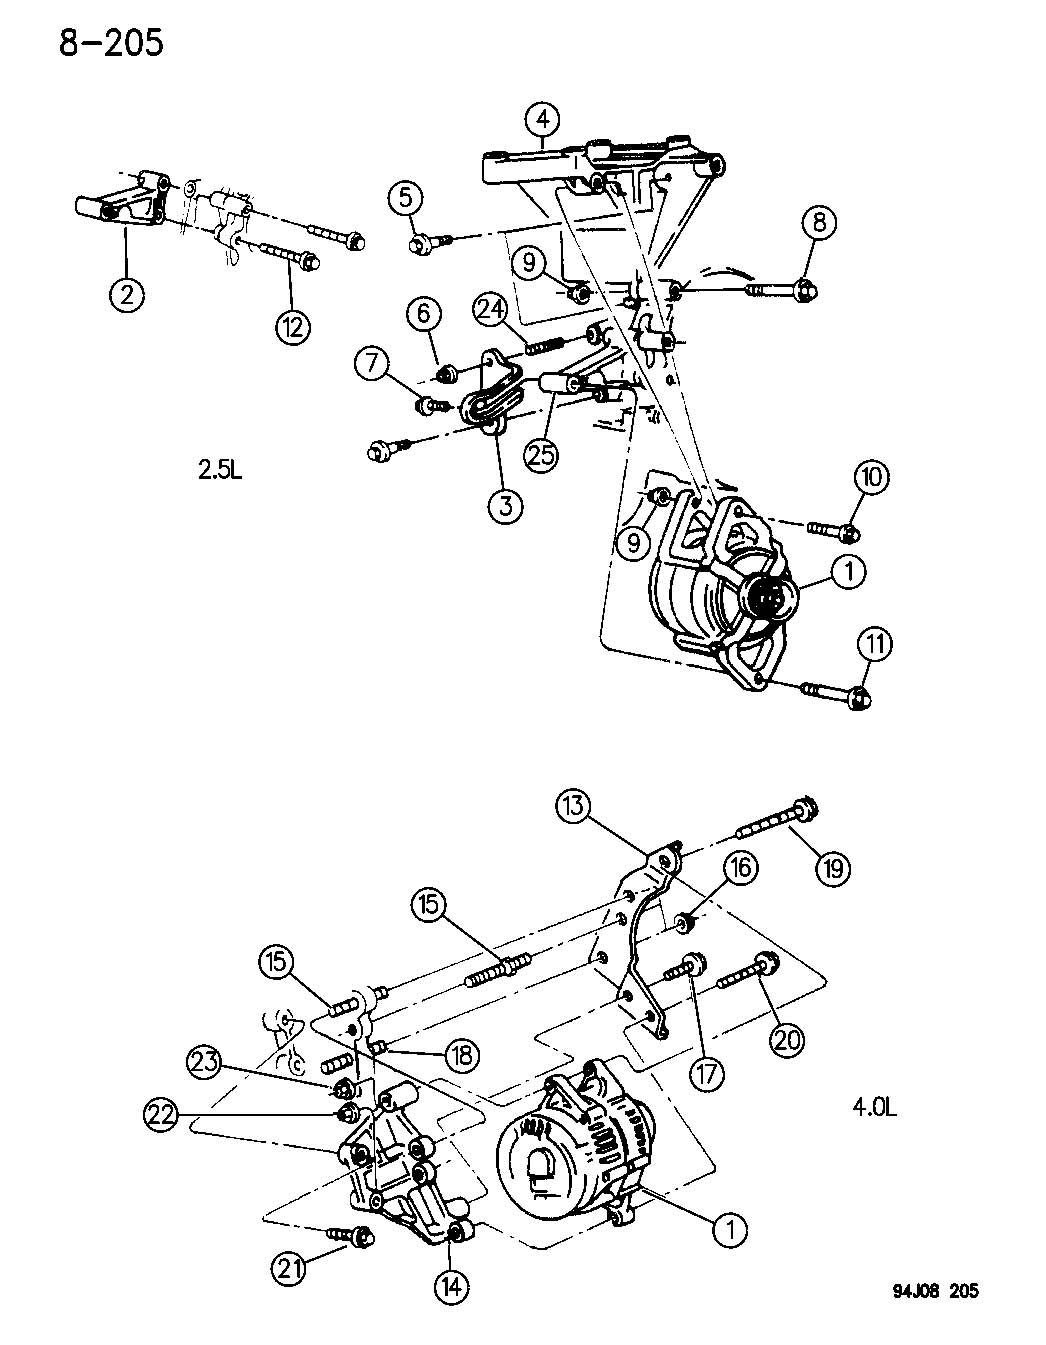 Wrangler Alternator Generator And Mounting 2 5 Amp 4 0 Engine